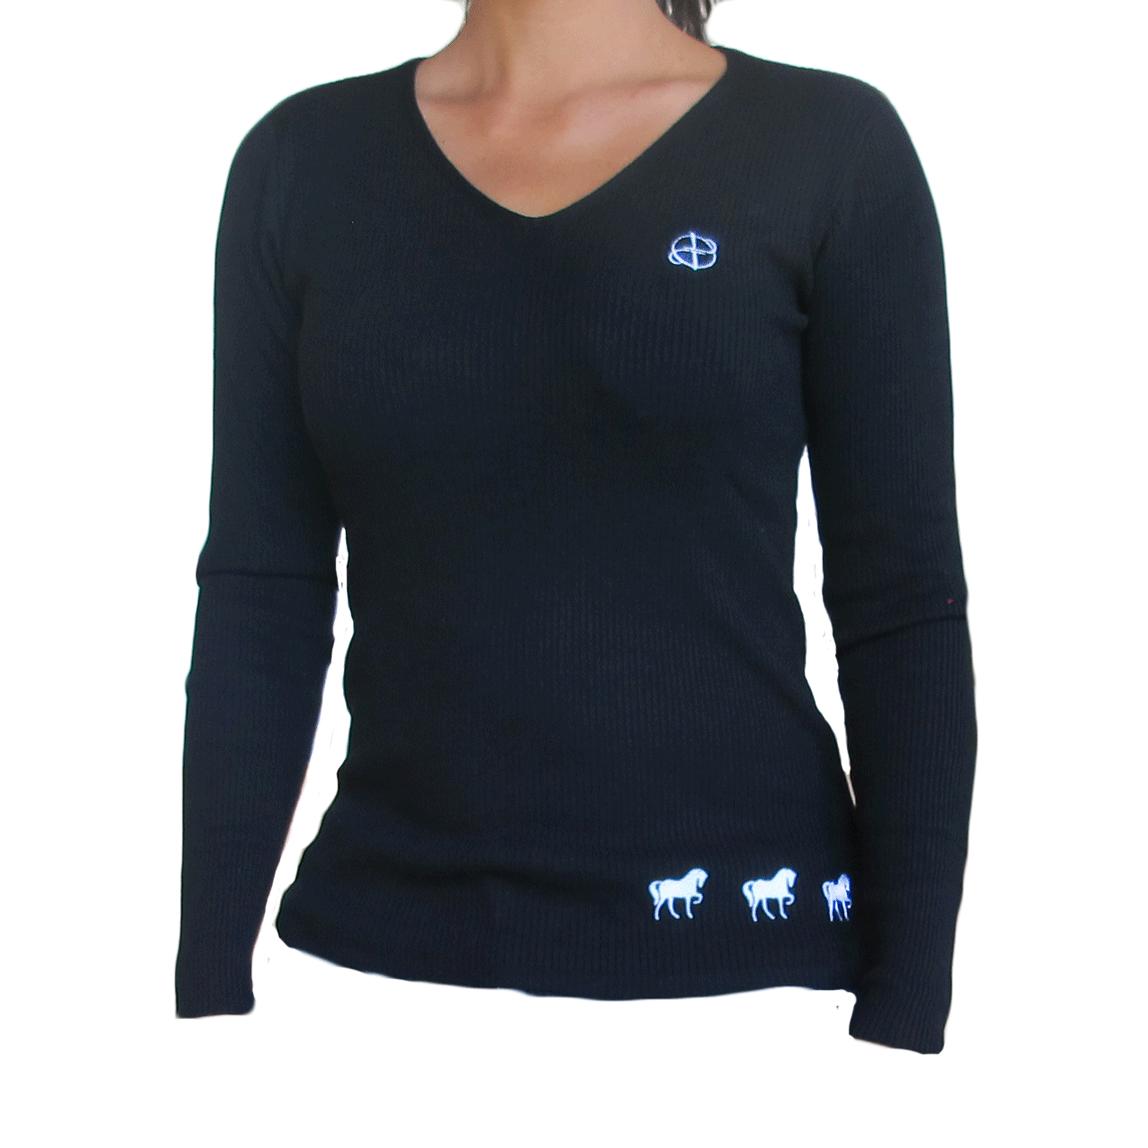 Blusa tricot bordada cavalinhos